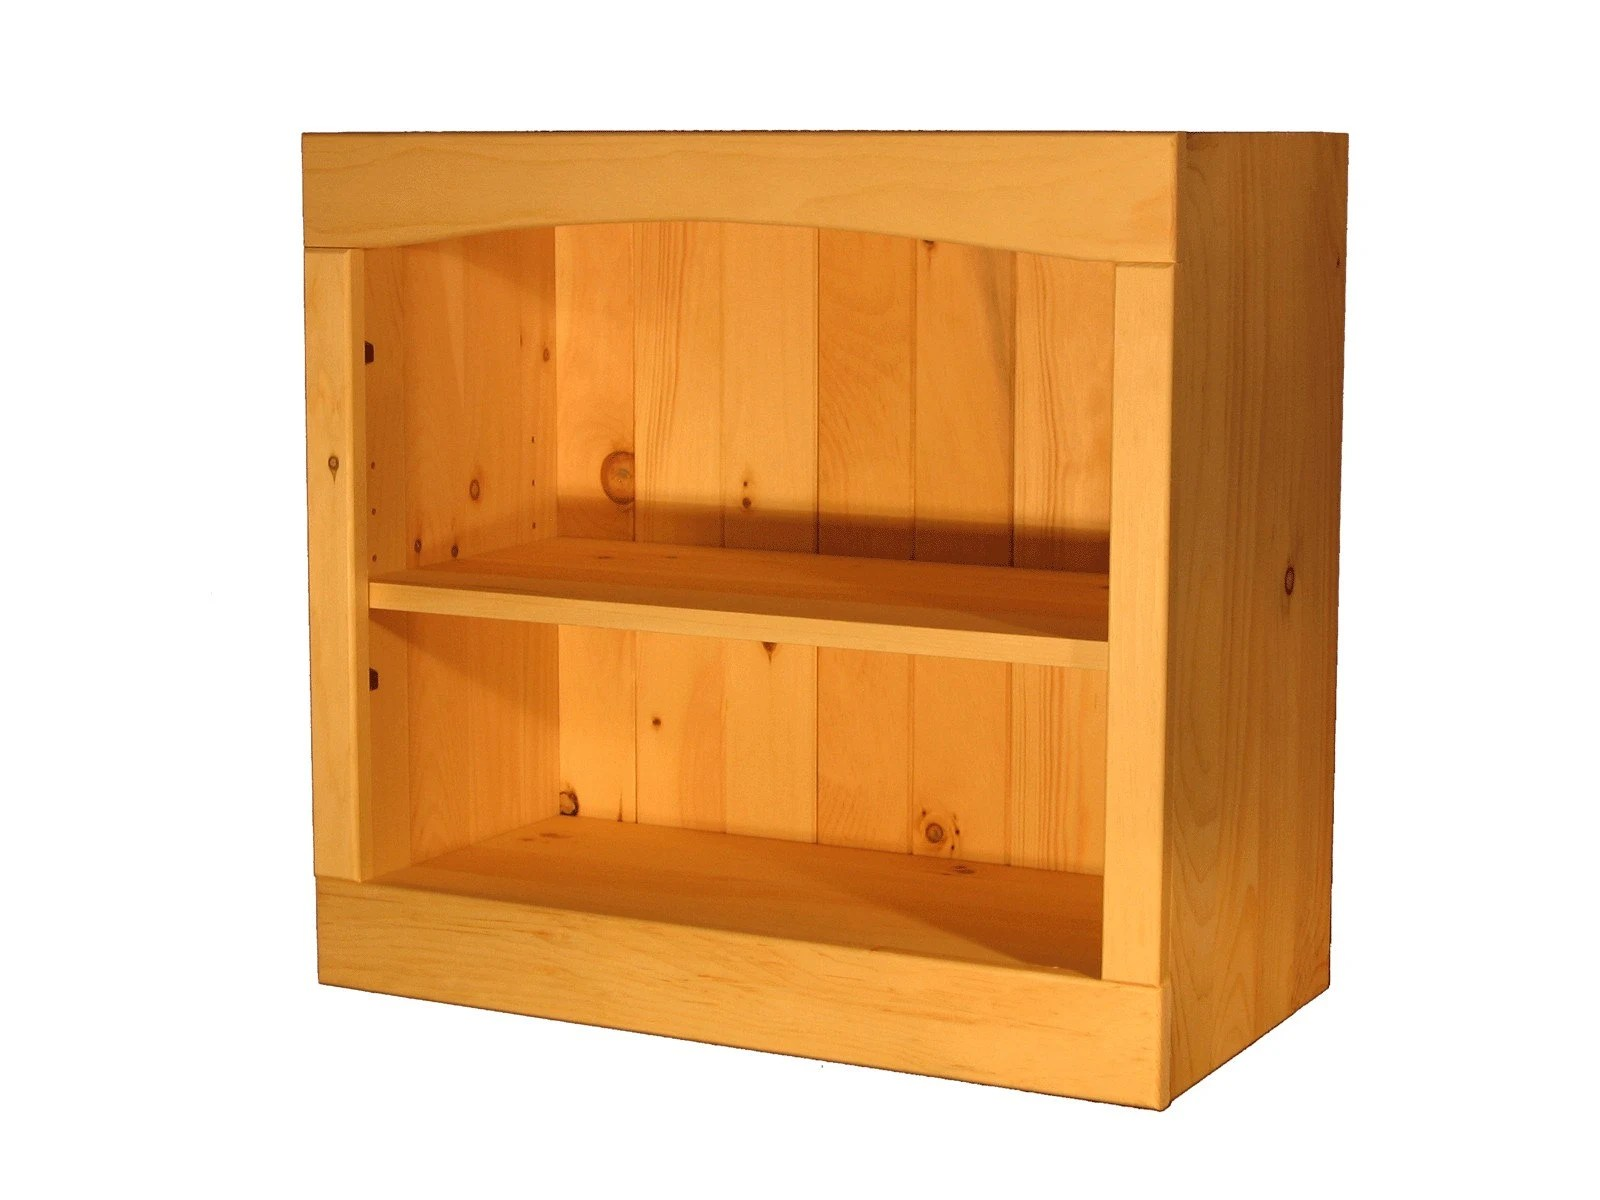 Solid Pine Bookcase 36w X 23h X 12d